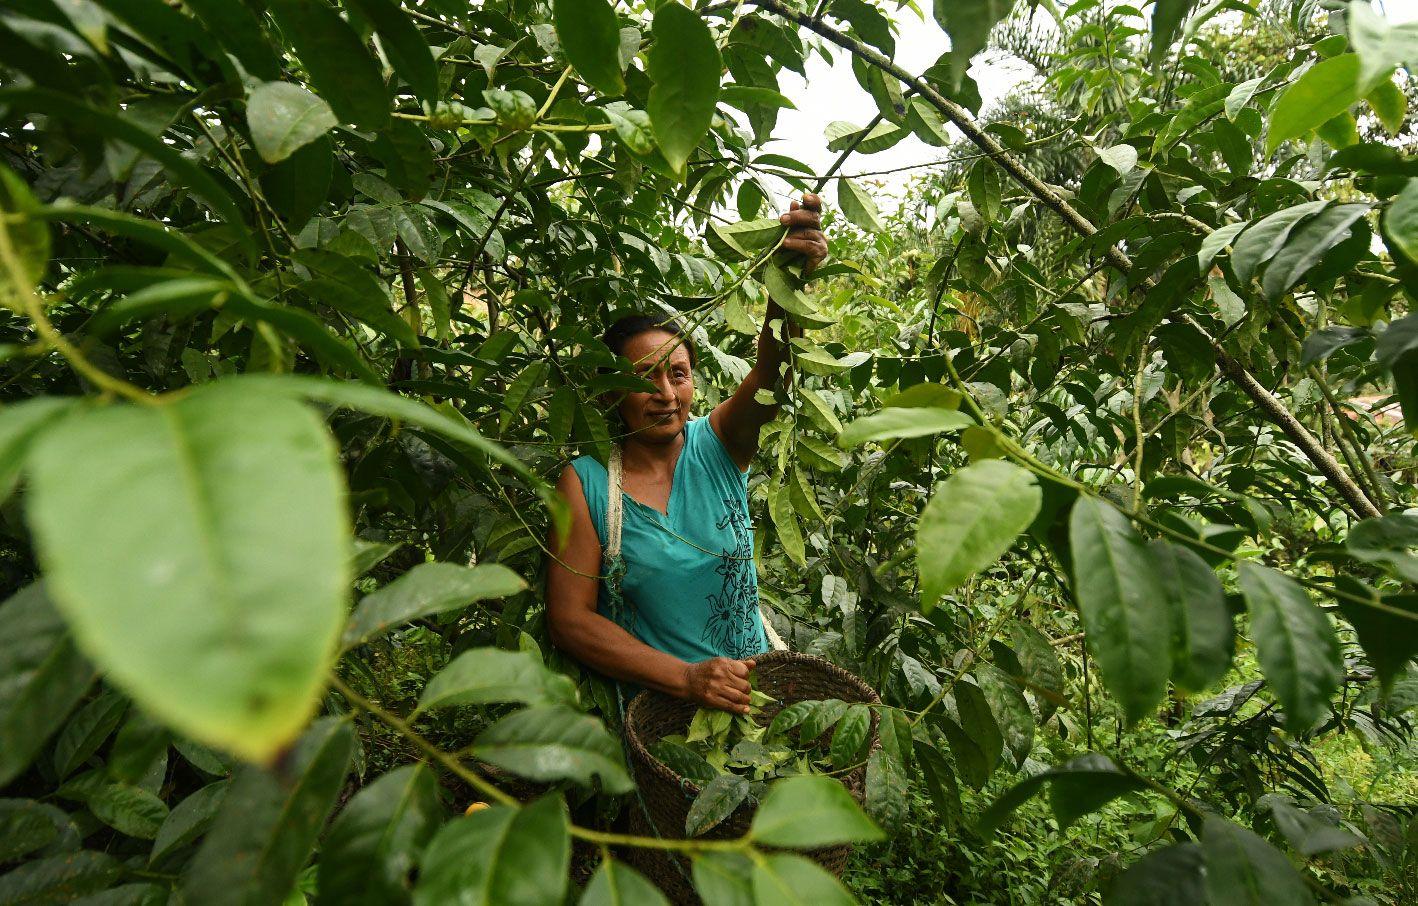 The Amazon Rainforest Also Known As Amazonia Or The Amazon Jungle